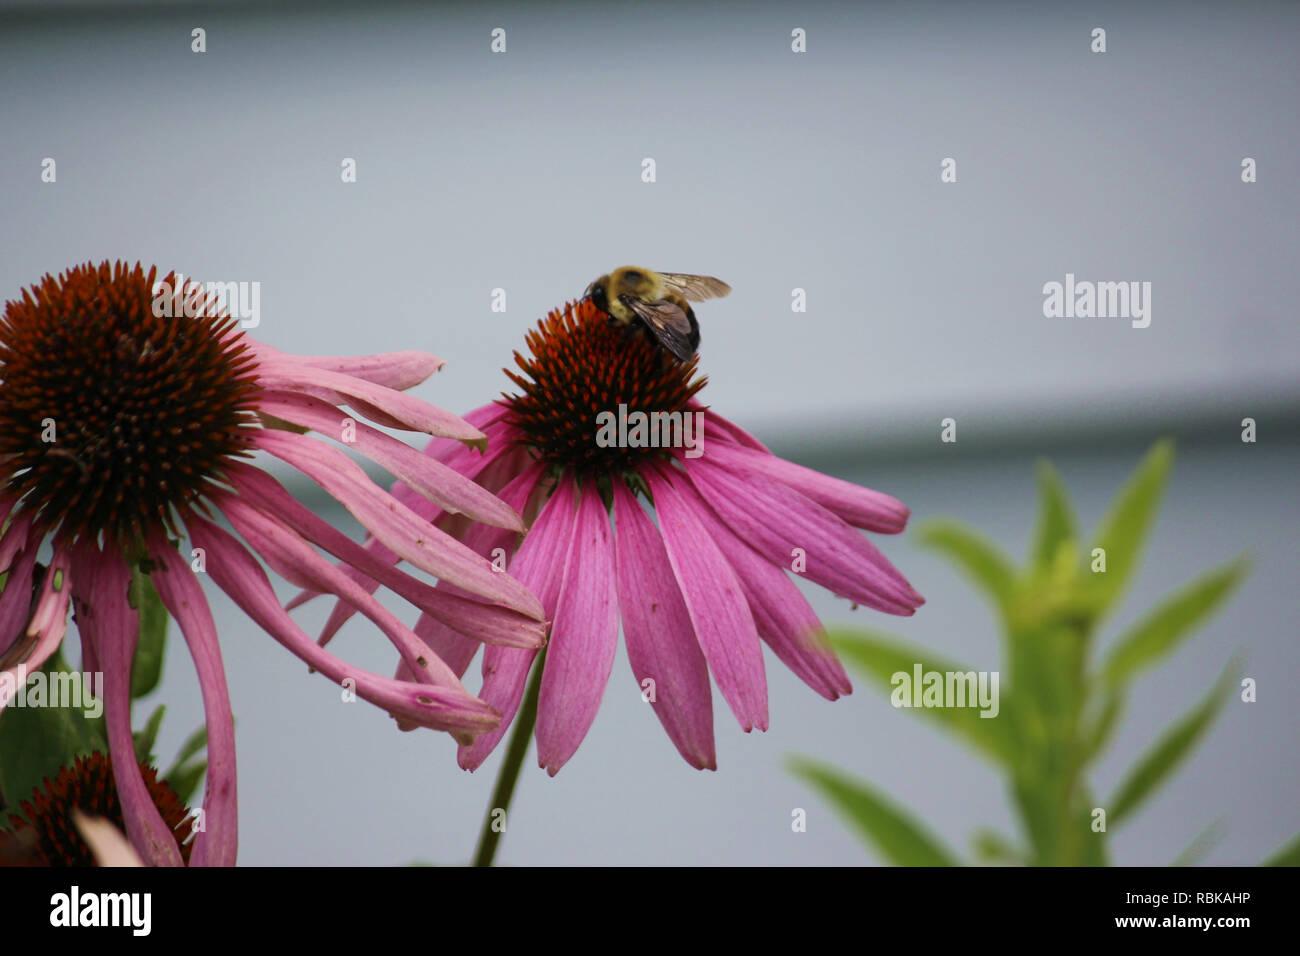 Macro shot of a bumblebee feeding on a purple Echinacea flower - Stock Image